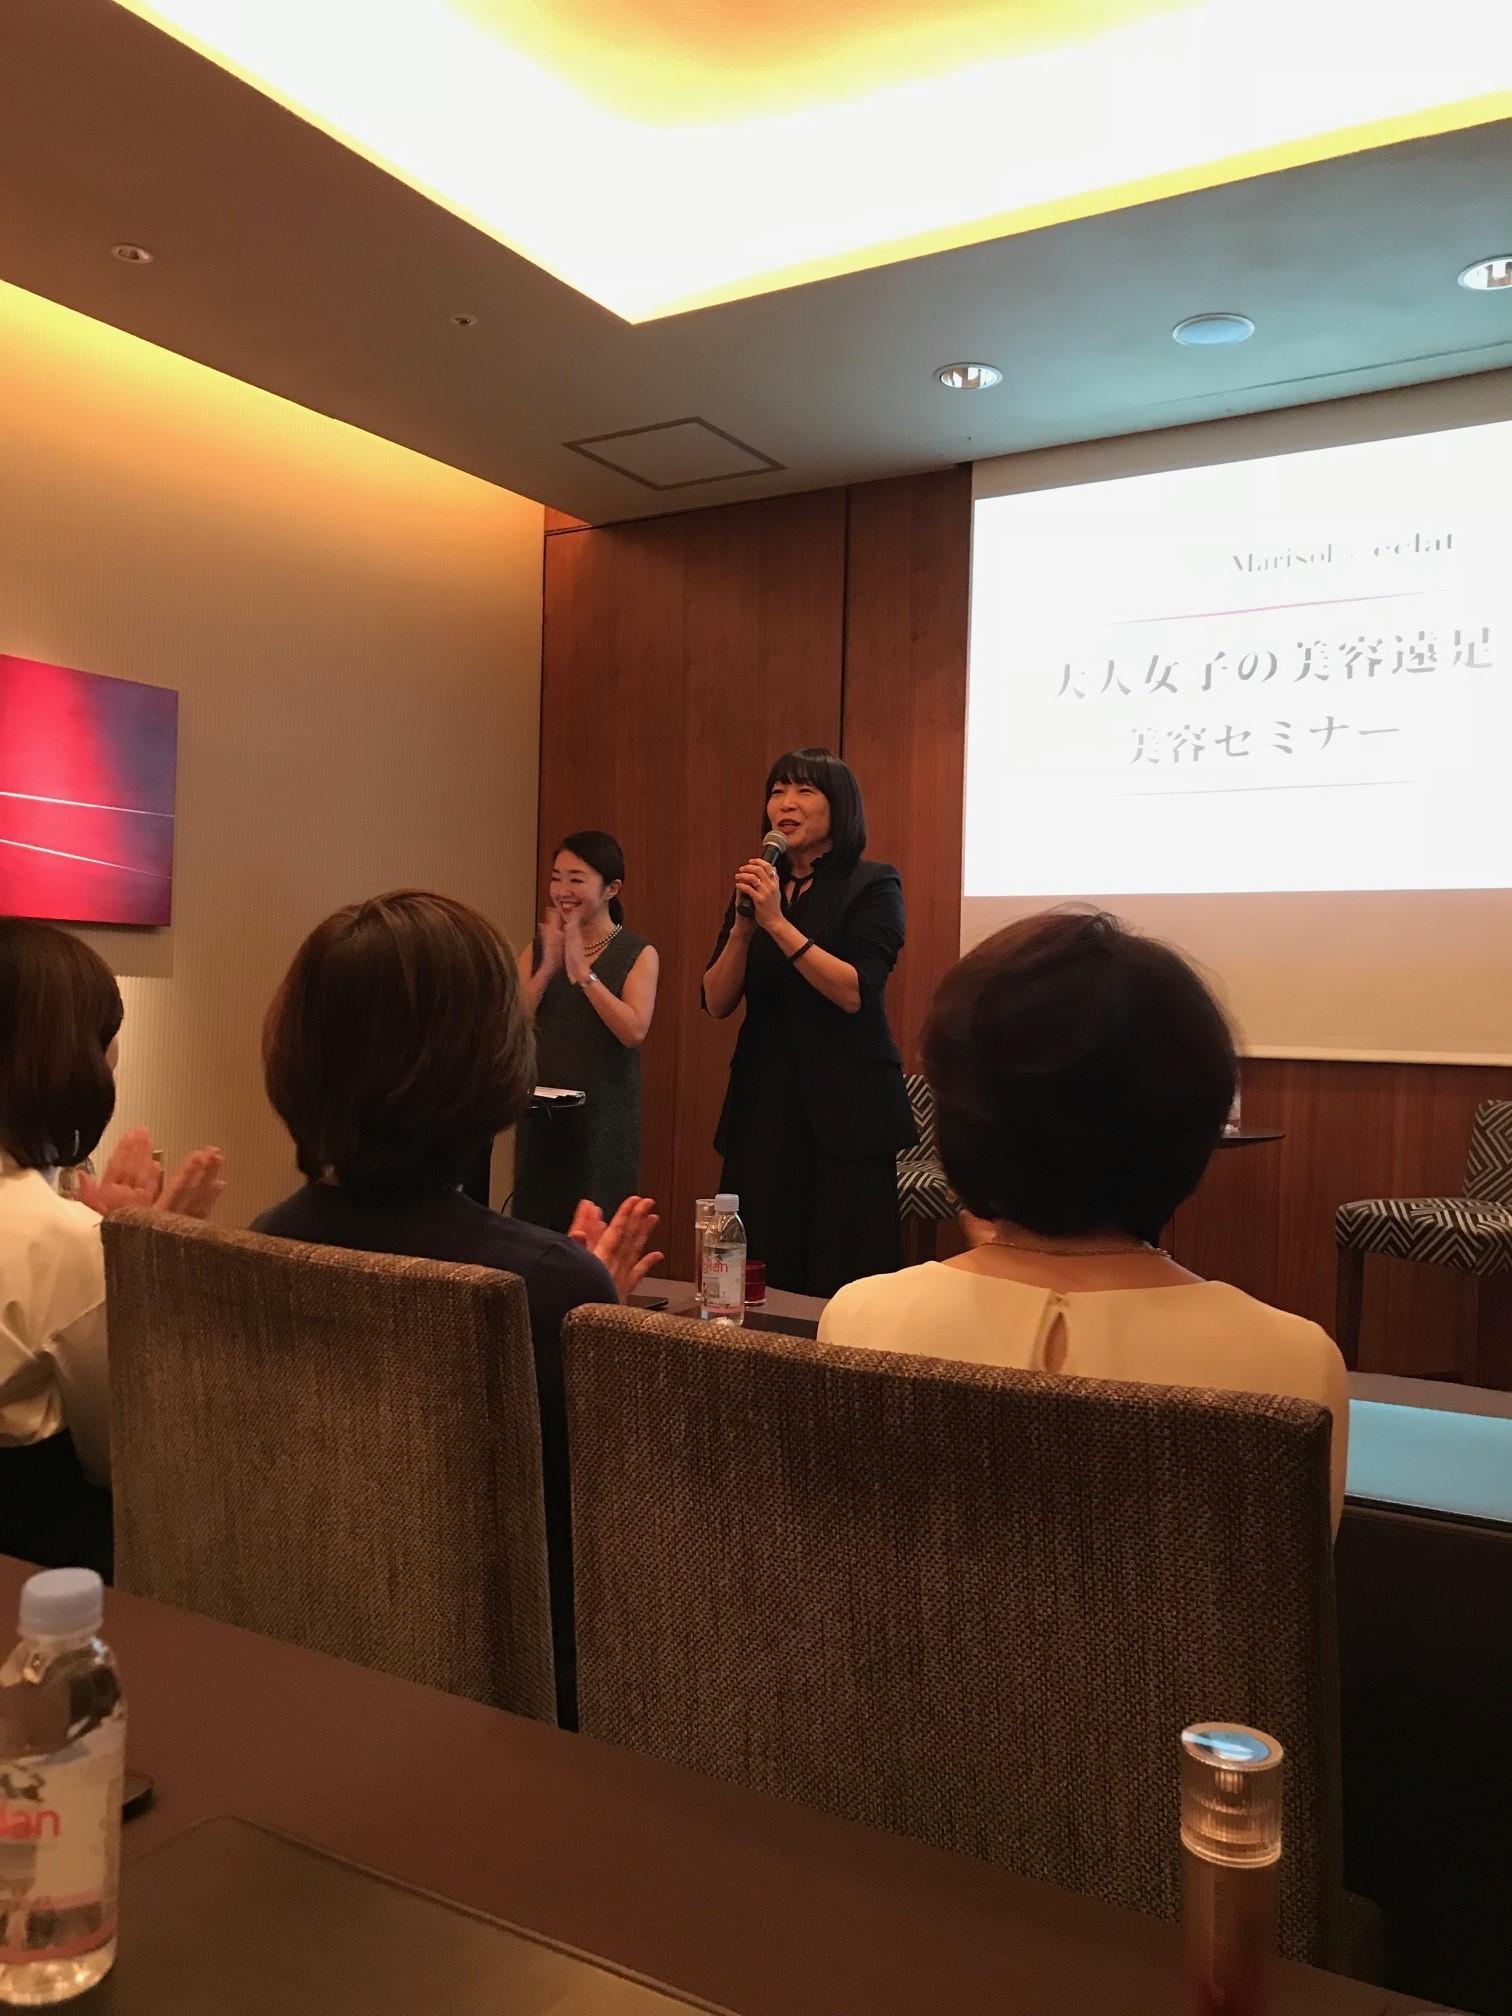 ASTALIFT with Marisol&eclat 大人女子の美容遠足~part.1~_1_8-1